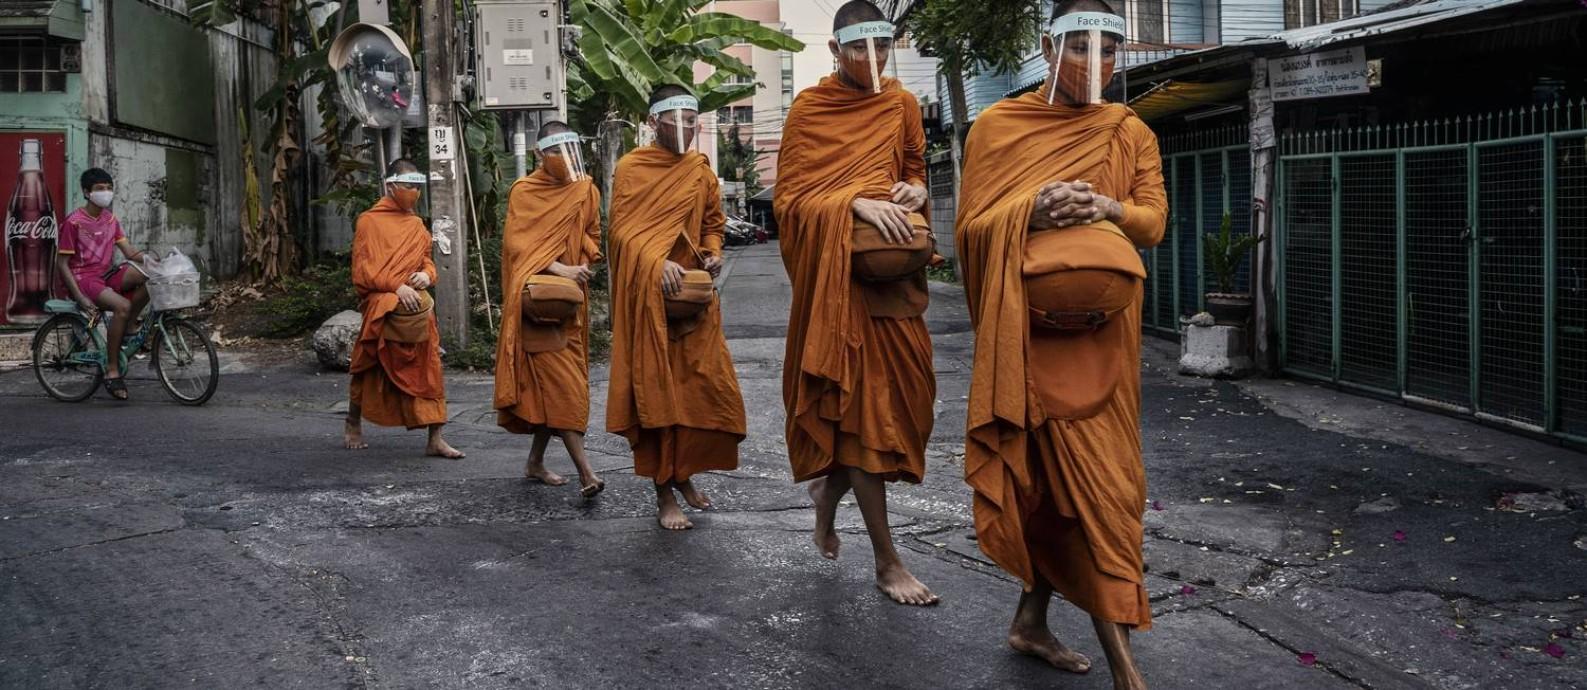 Monges tailandeses usam máscara e viseira para se protegerem da Covid-19 Foto: ADAM DEAN / NYTN